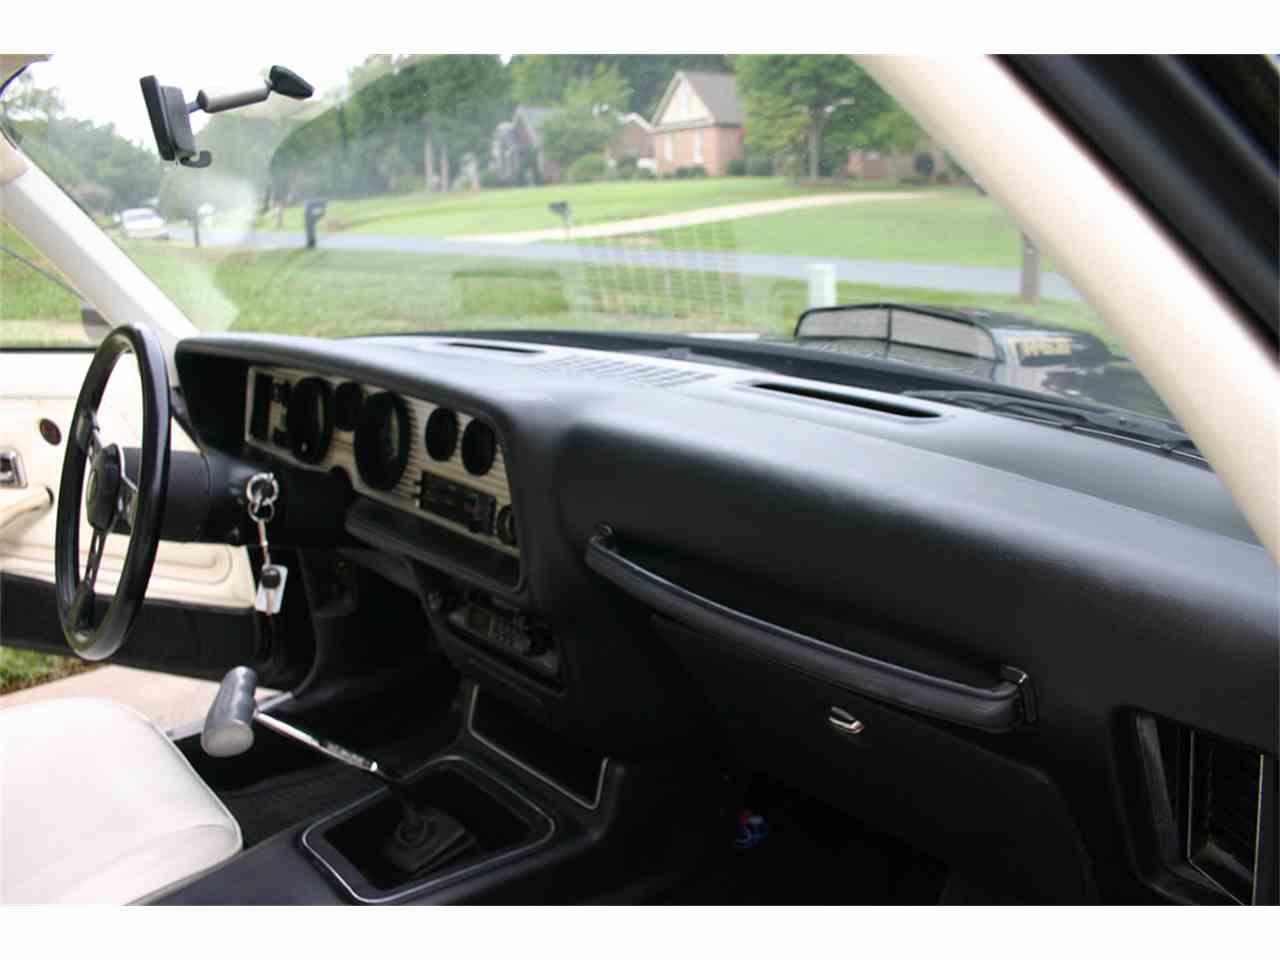 1978 pontiac firebird trans am for sale cc 1025448. Black Bedroom Furniture Sets. Home Design Ideas